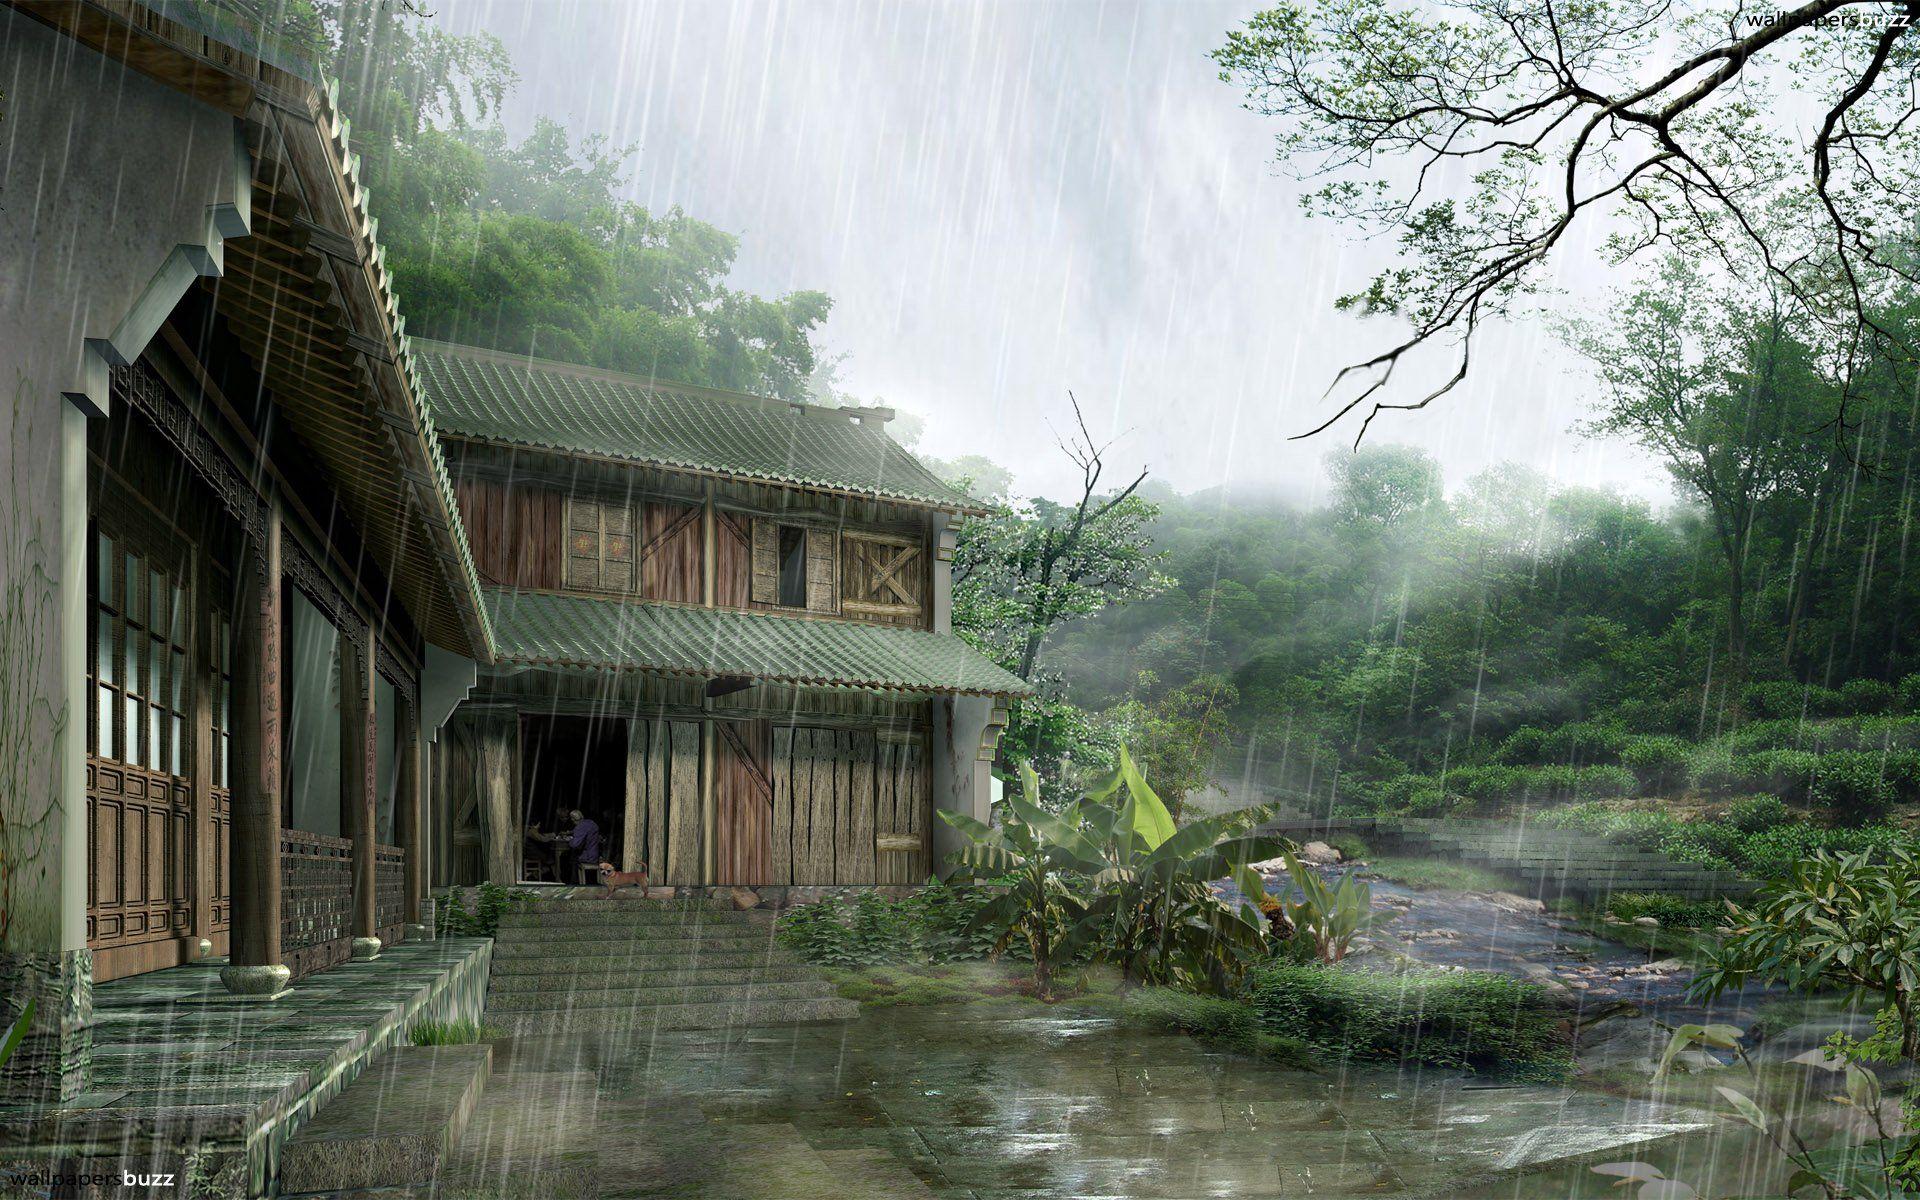 Rainy Wallpaper Hd 1